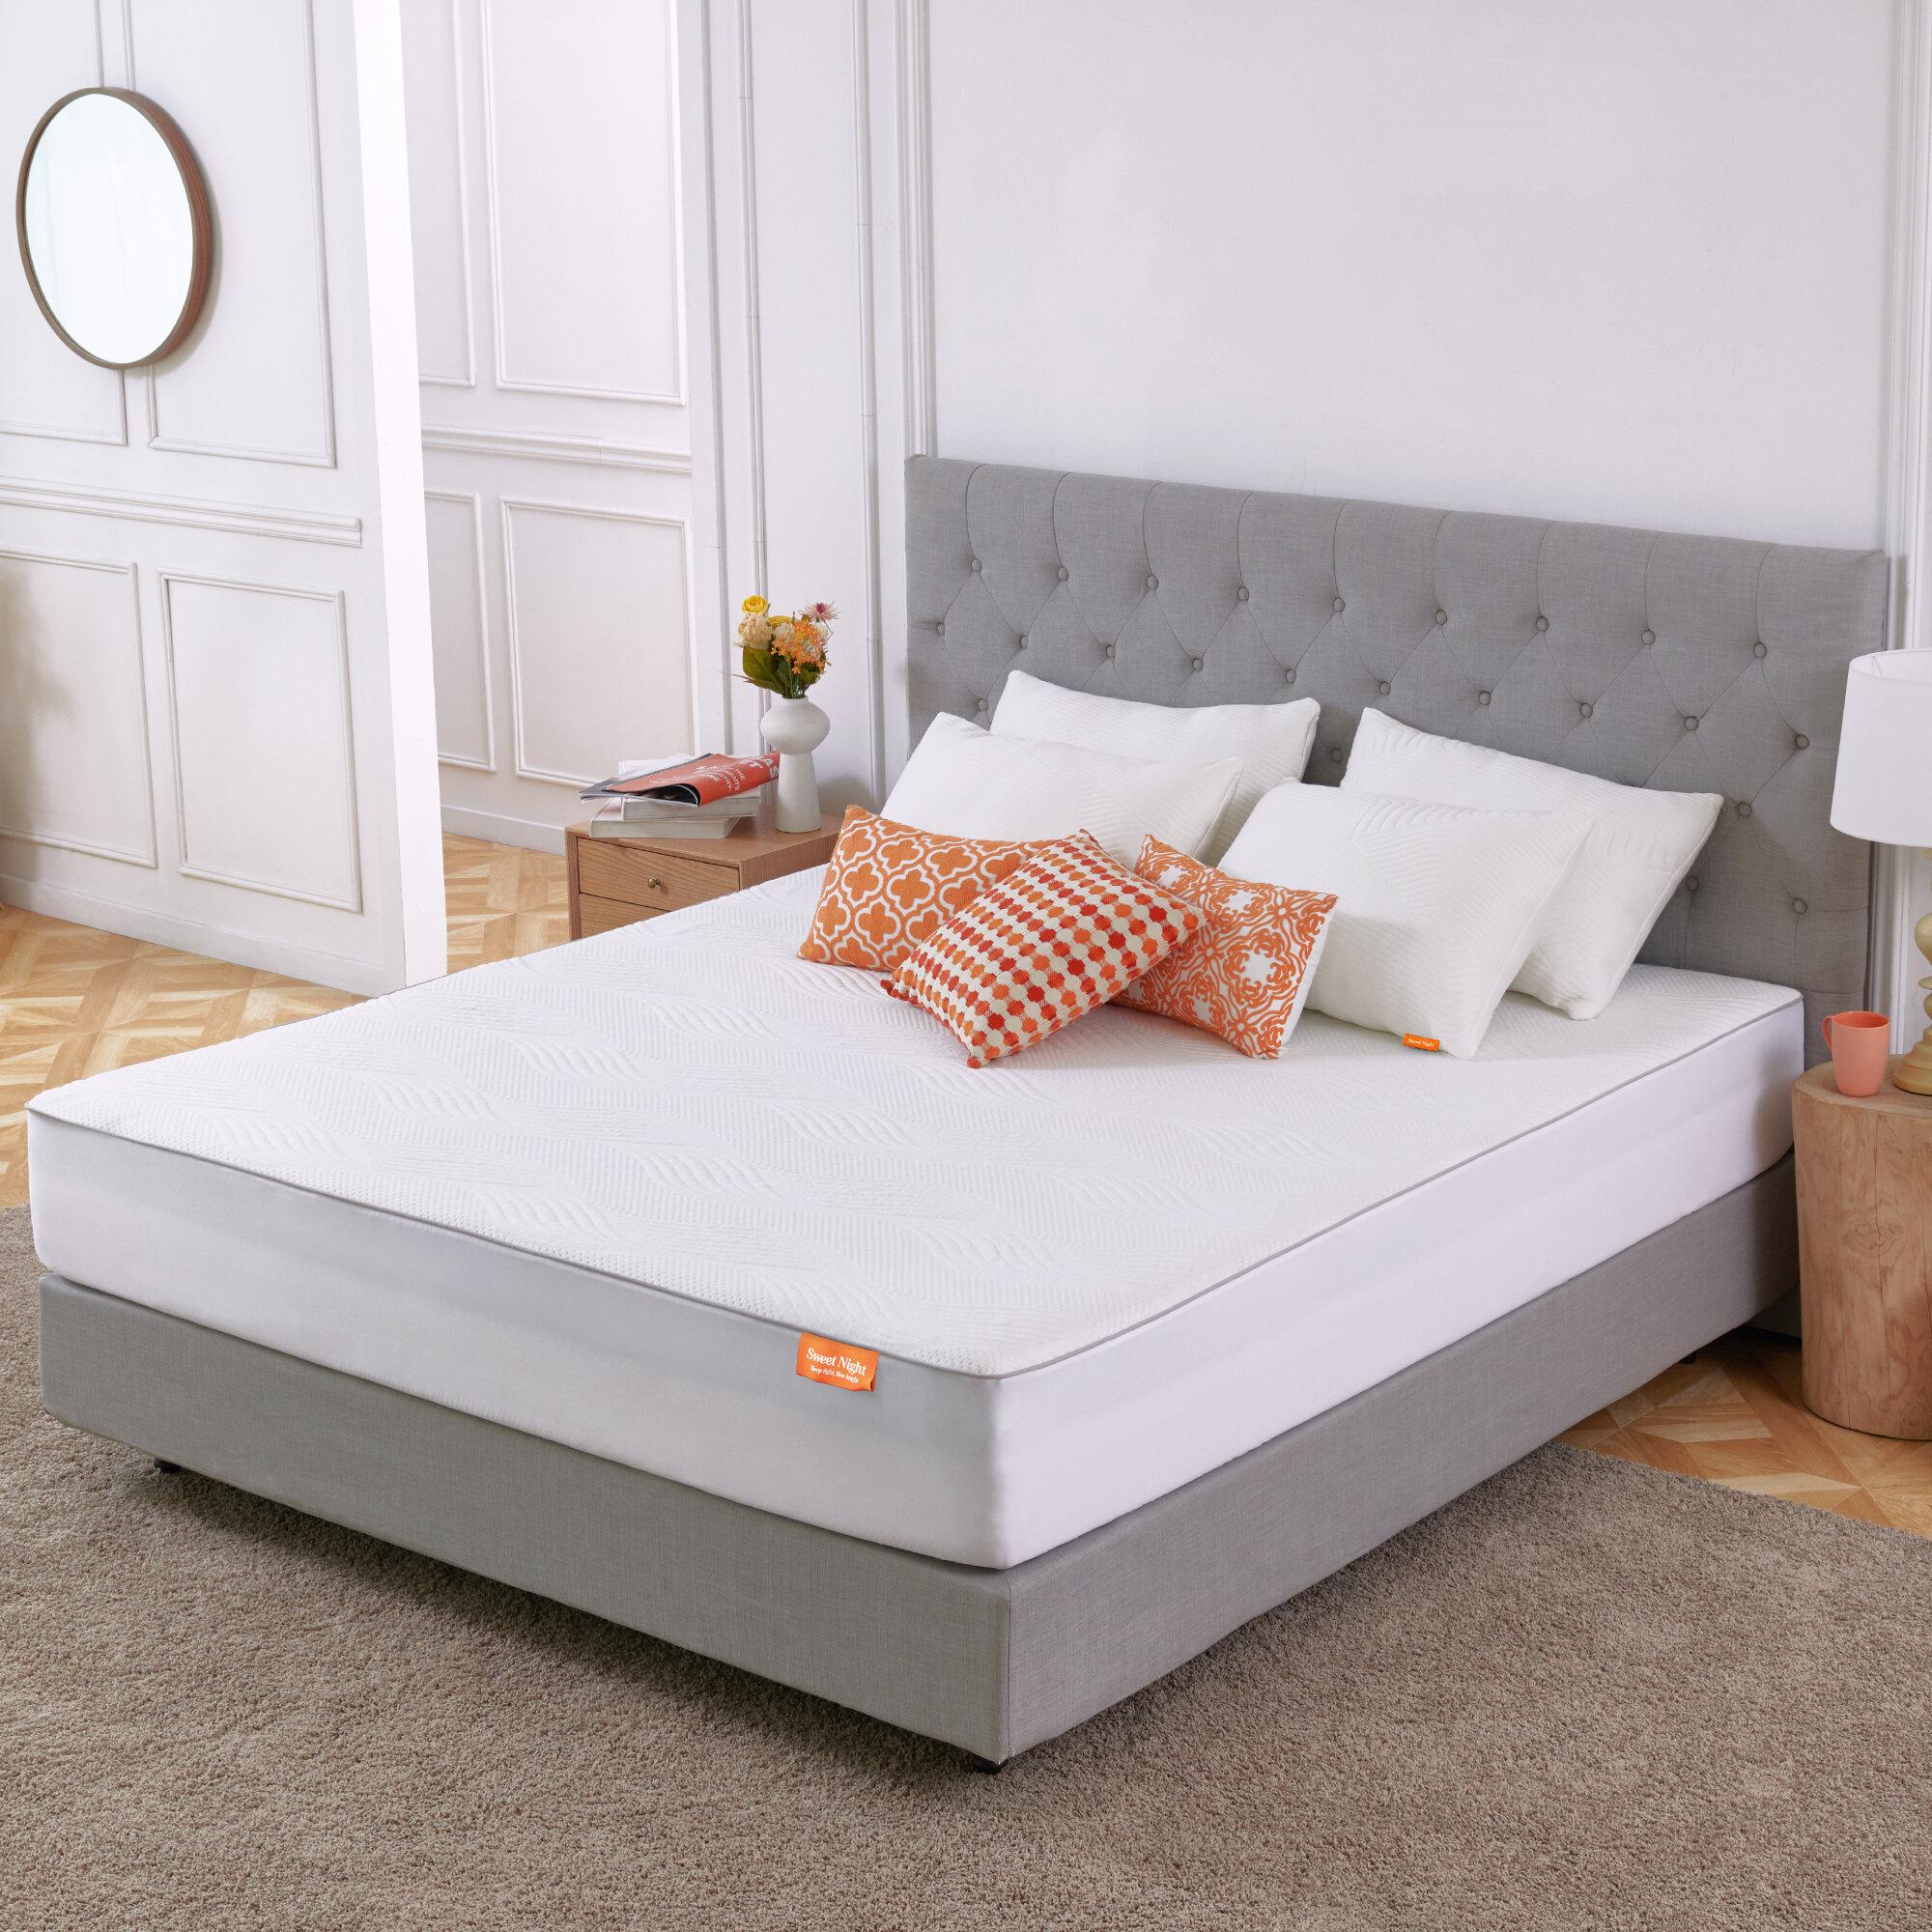 Sweetnight 4 Gel Memory Foam Mattress Topper Reviews Wayfair